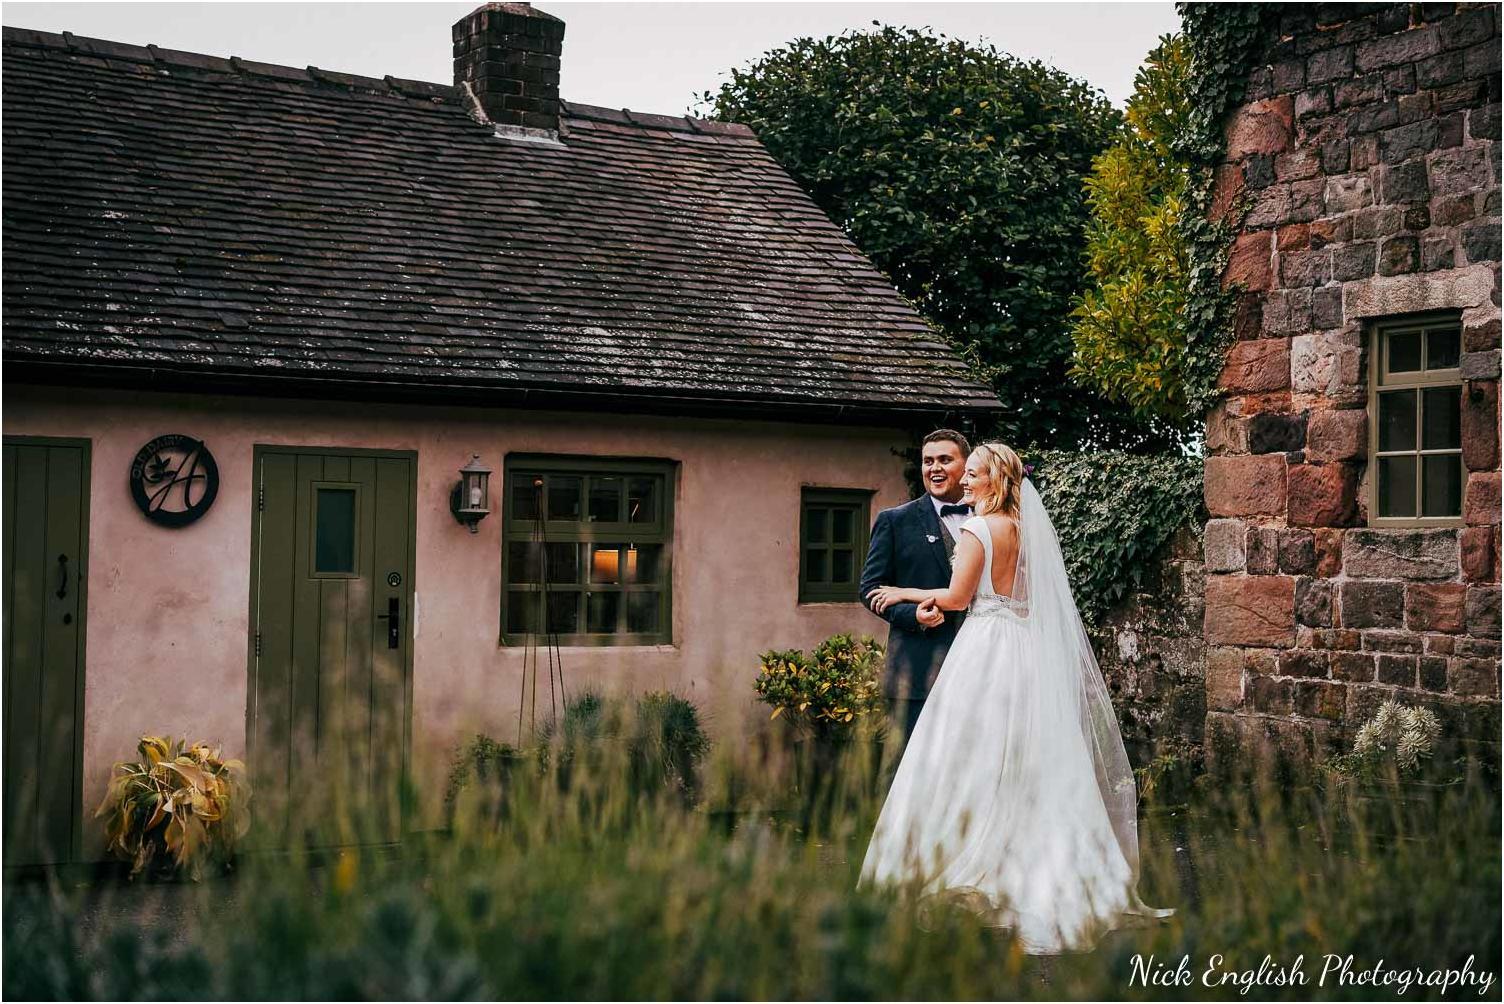 The_Ashes_Barn_Endon_Stoke_Wedding_Photographer-96.jpg